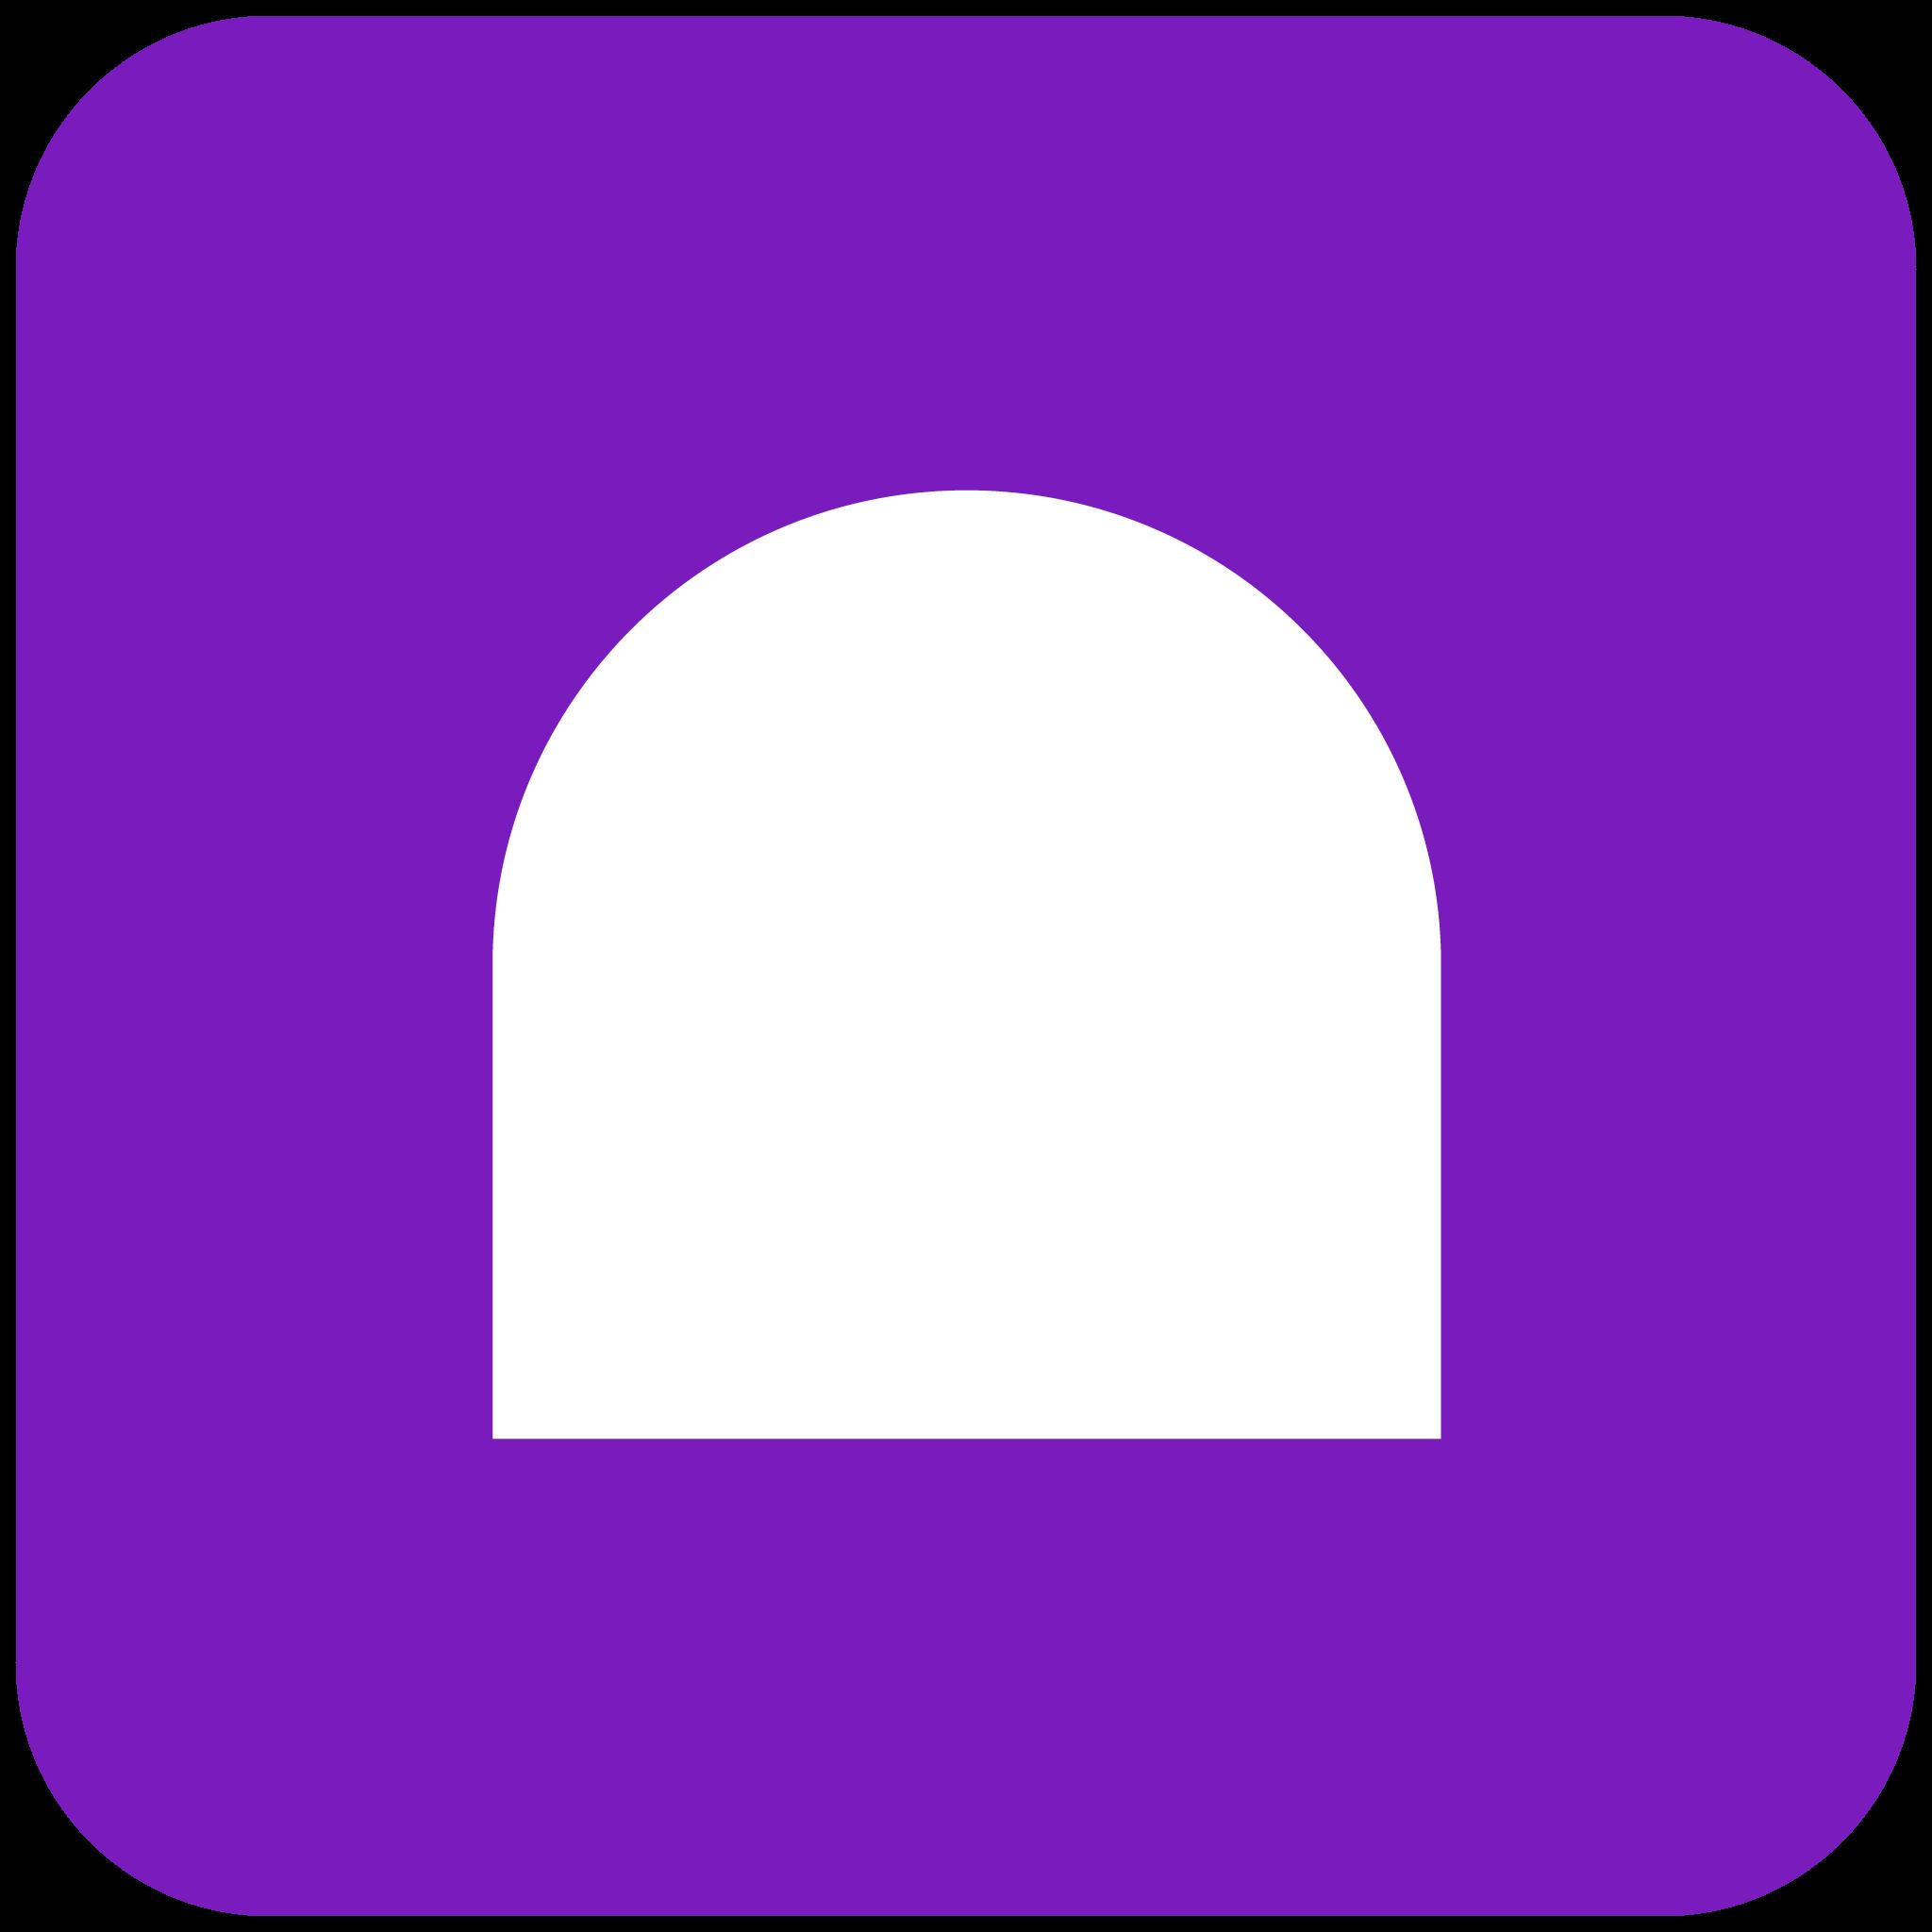 aula-symbol-color.png